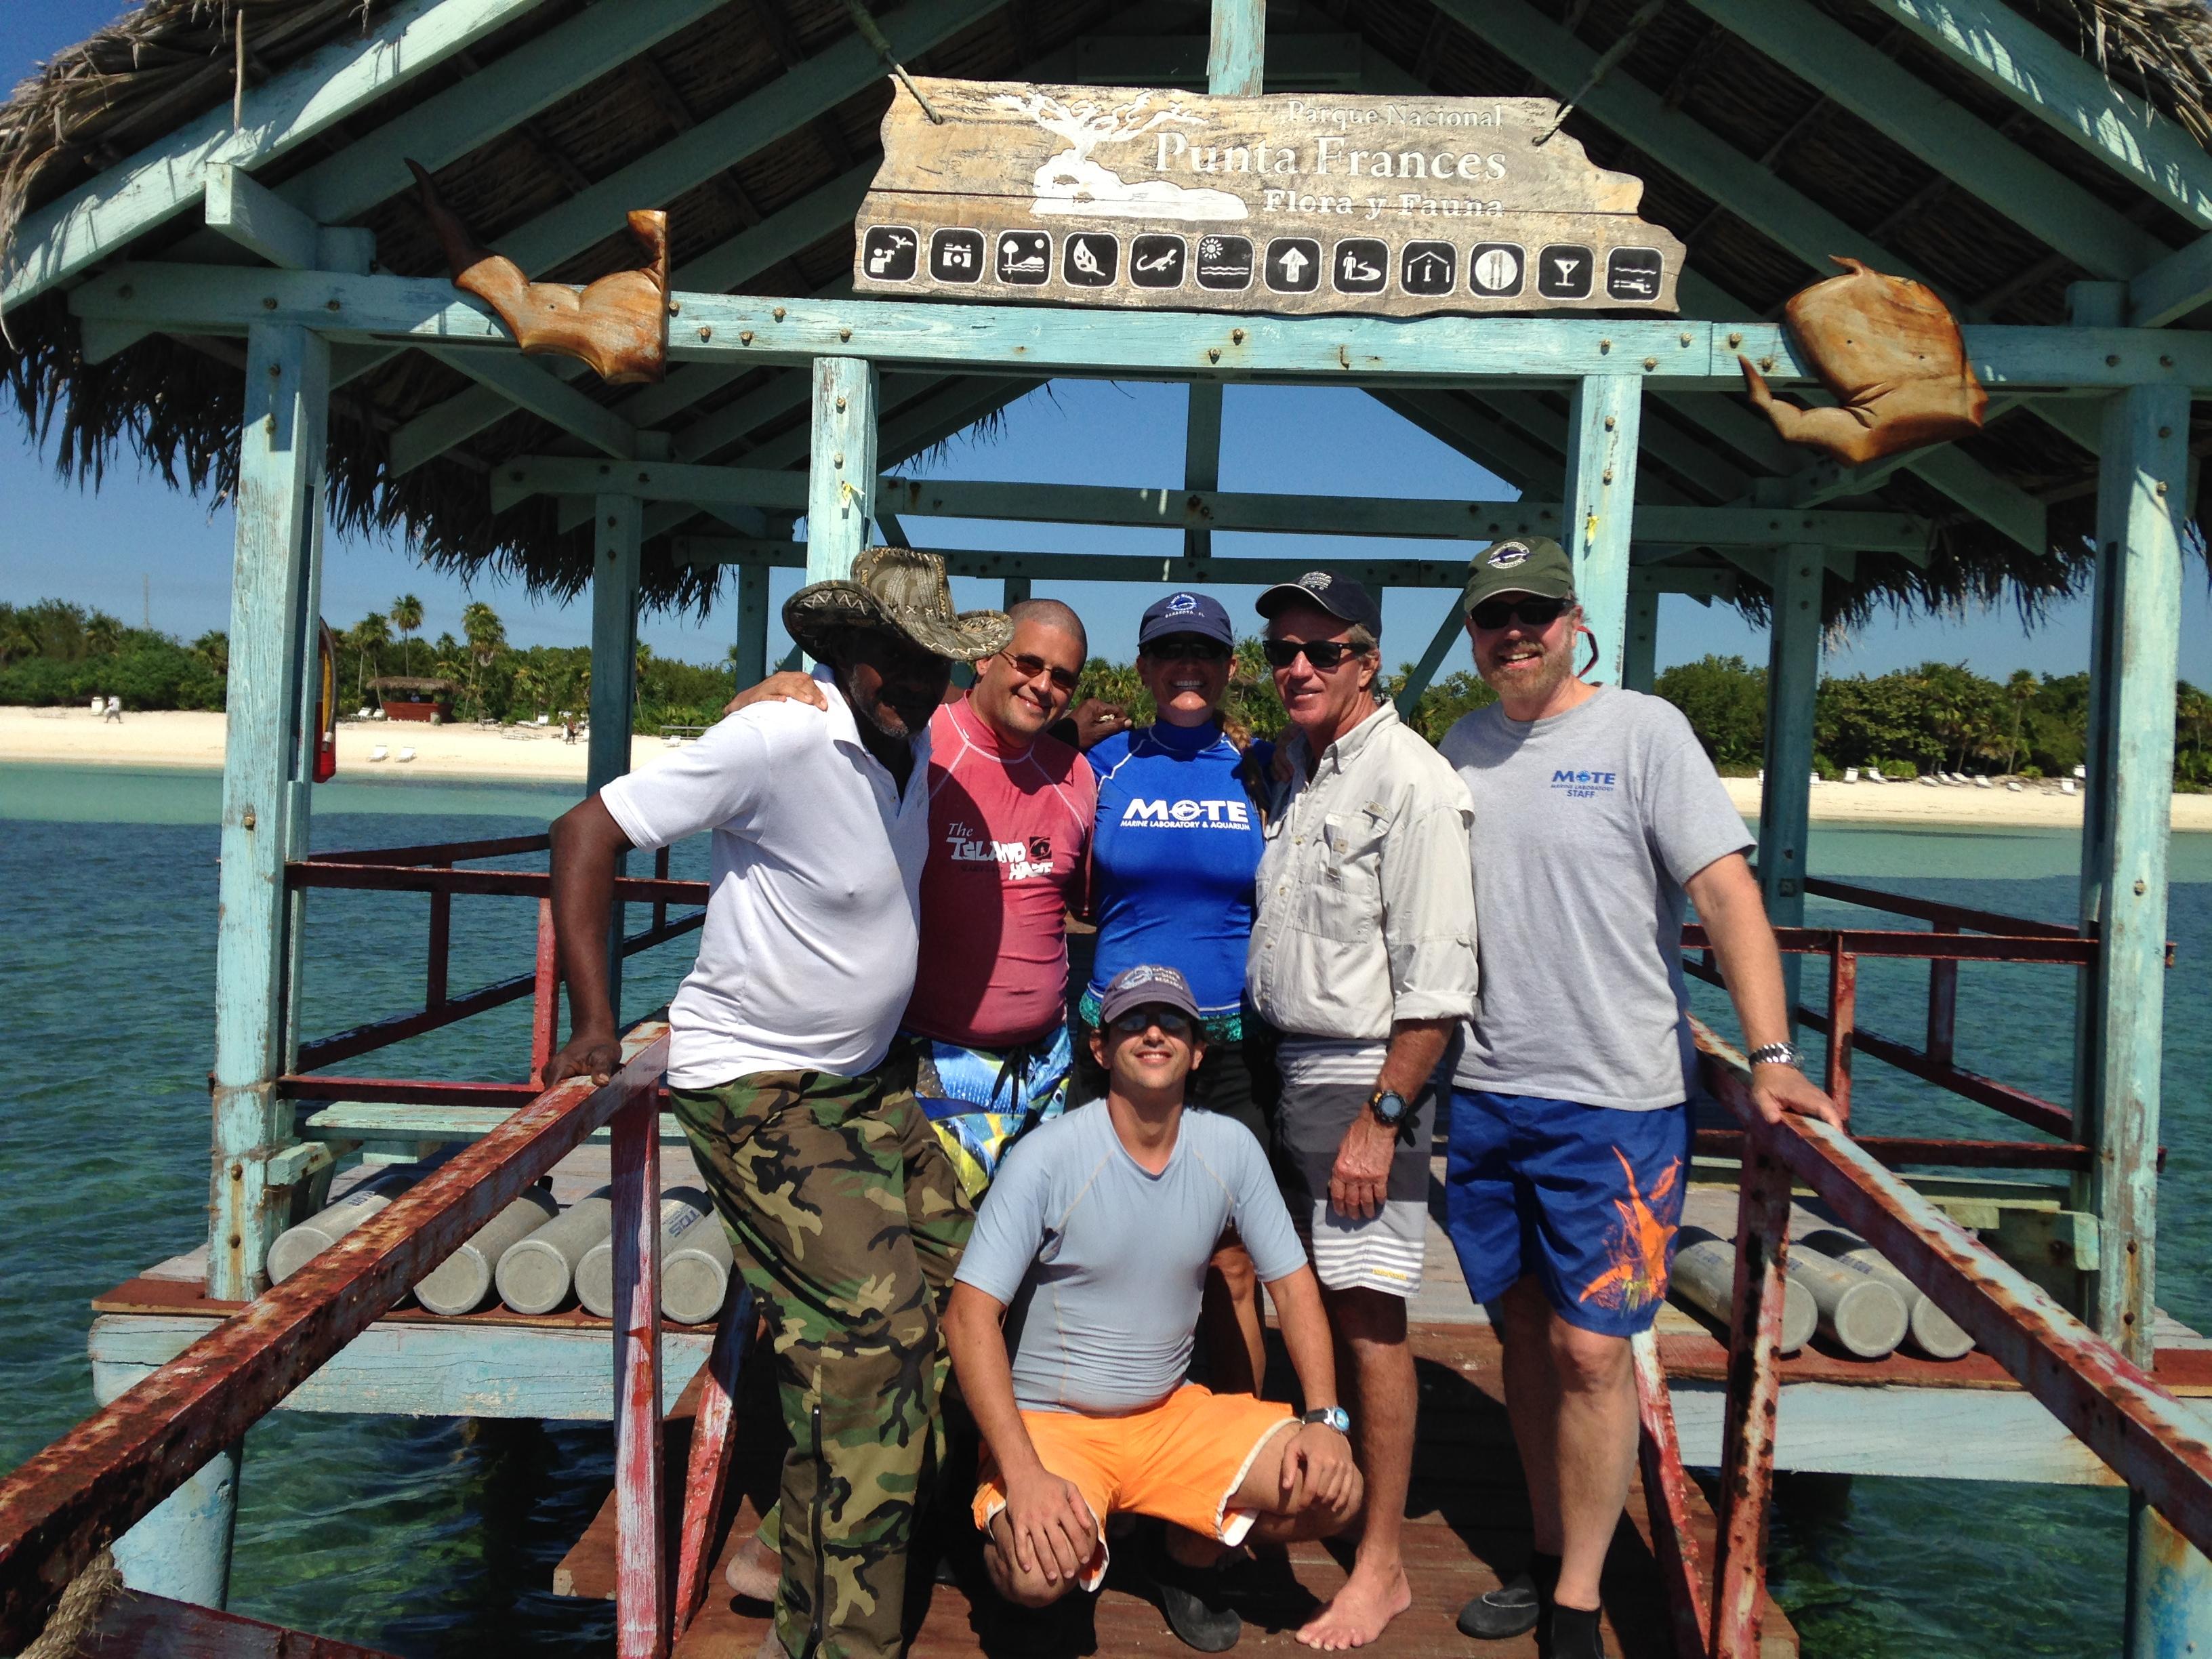 Mote and CIM staff taking a shore break at Punta Frances, Isla de la Juventud, Cuba. Photo credit: Kim Bassos-Hull – Mote Marine Lab